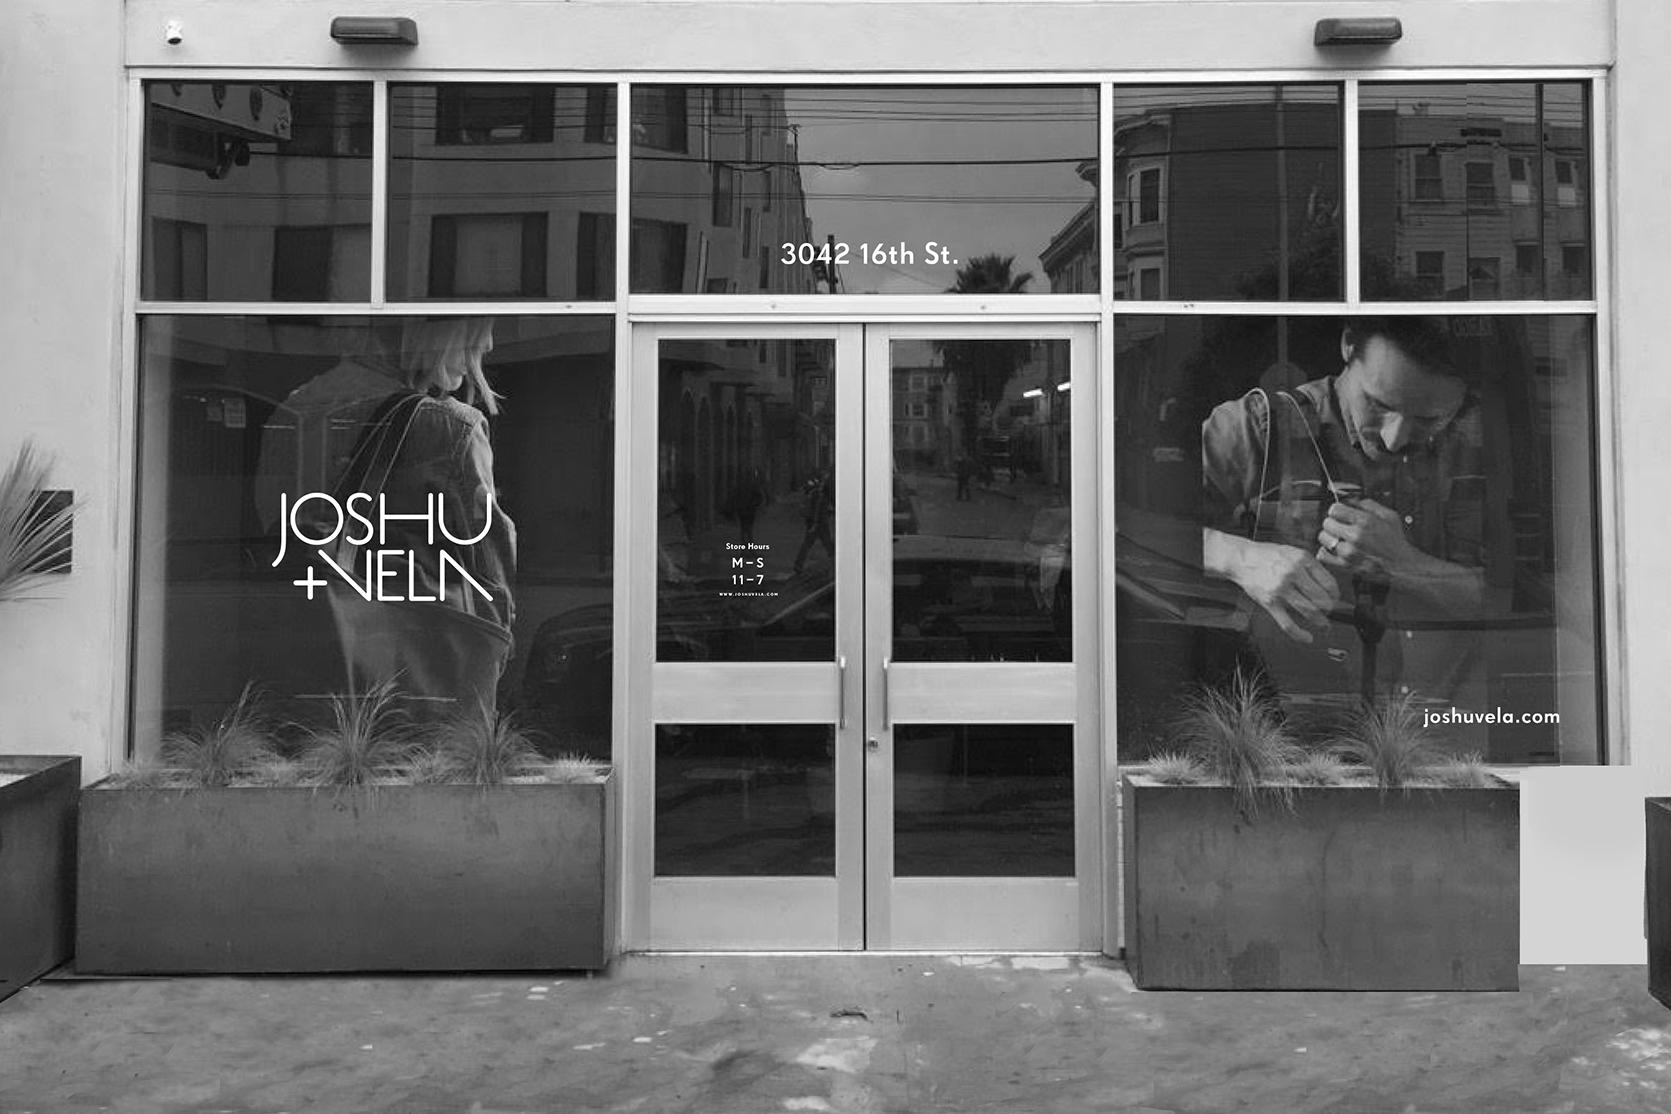 Julia-Kostreva-Studio-Branding-Joshu-Vela--Window-Signage.jpg